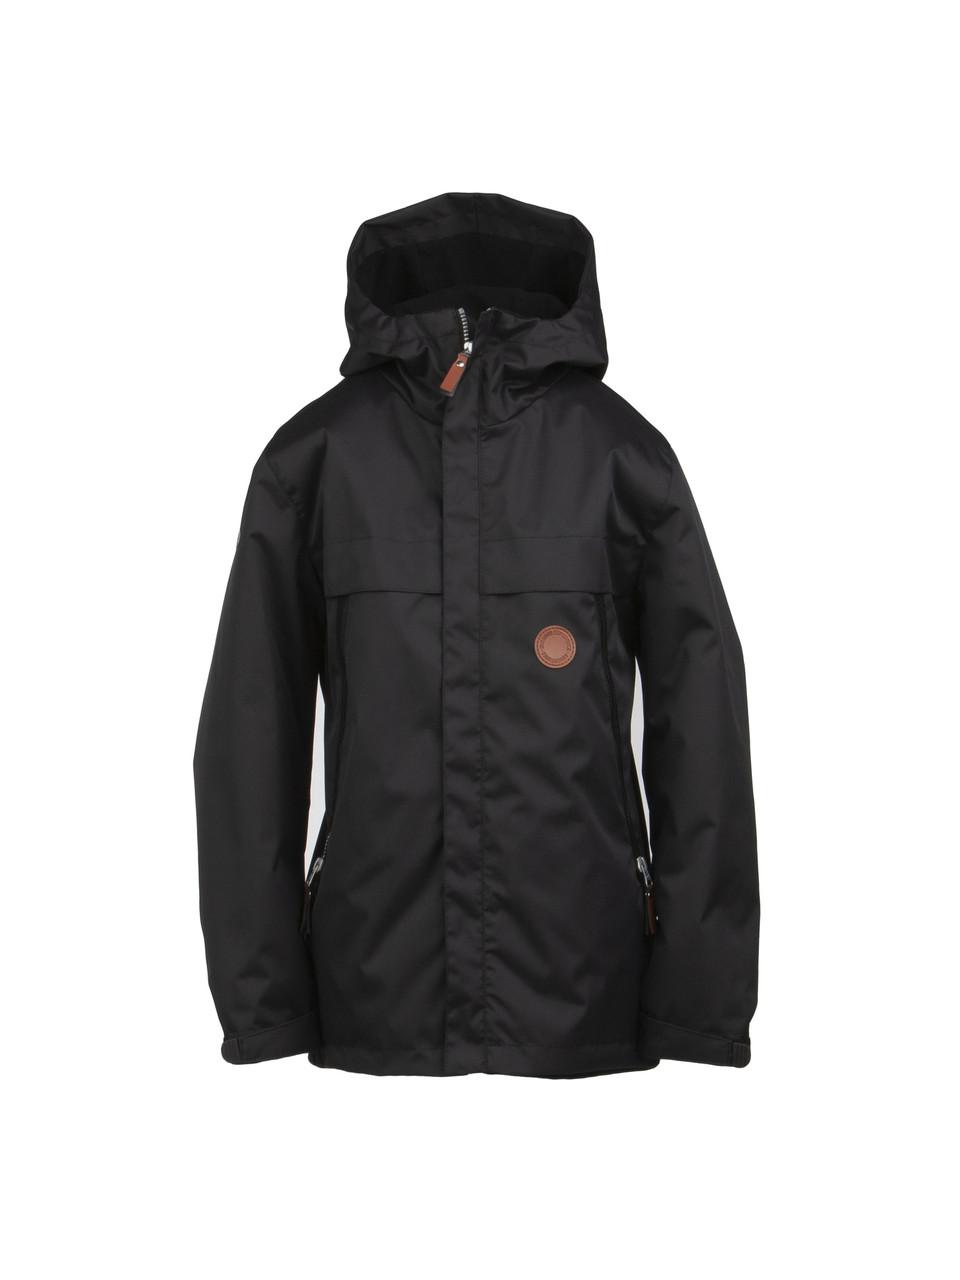 Kуртка для мальчиков Kerry RODDY